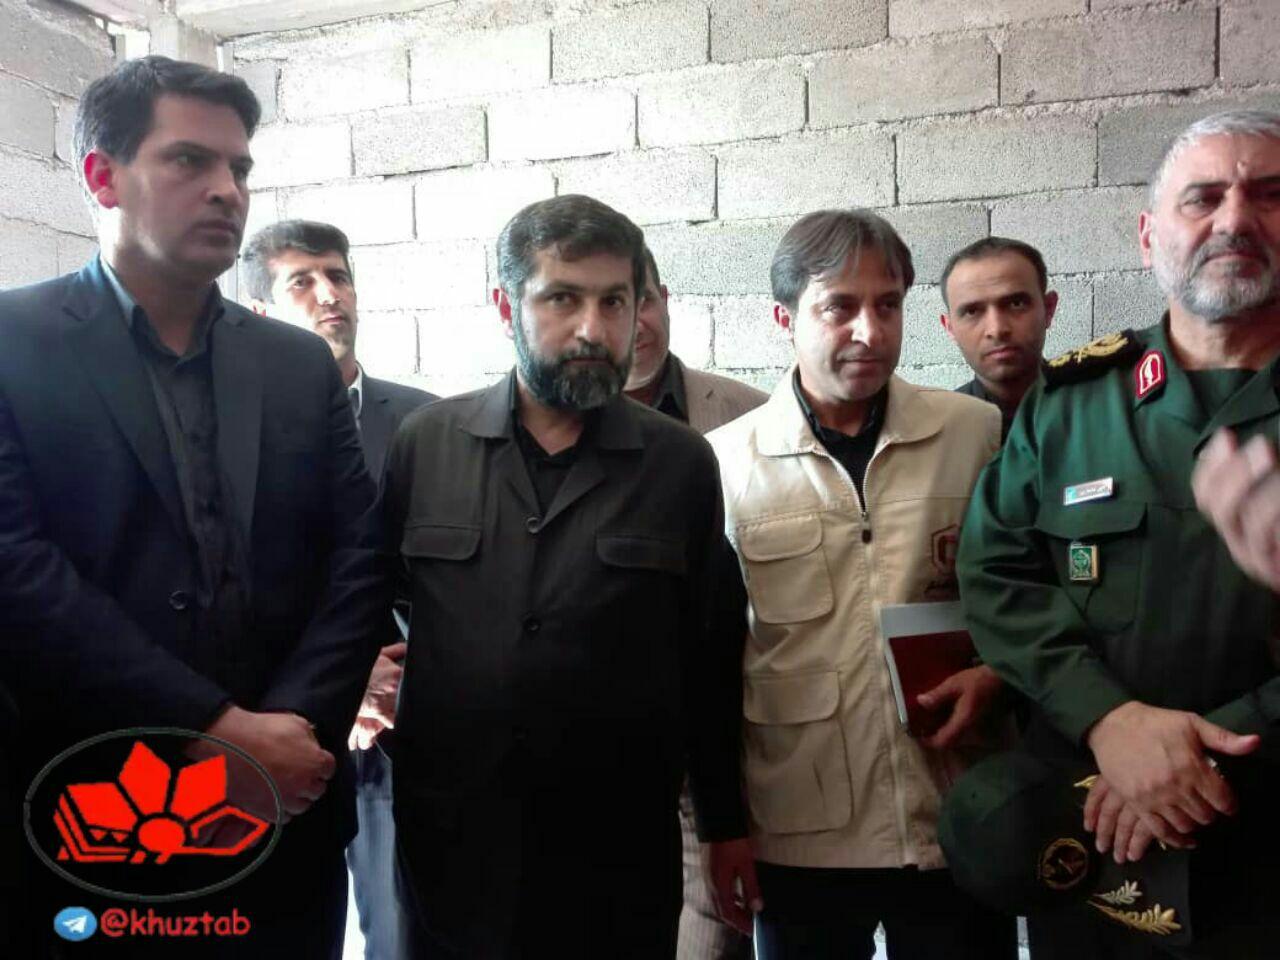 IMG 20190908 123743 331 ۱۳ هزار خانه سیلزده در خوزستان بازسازی شد/ تحویل منازل در حال احداث تا بهمنماه